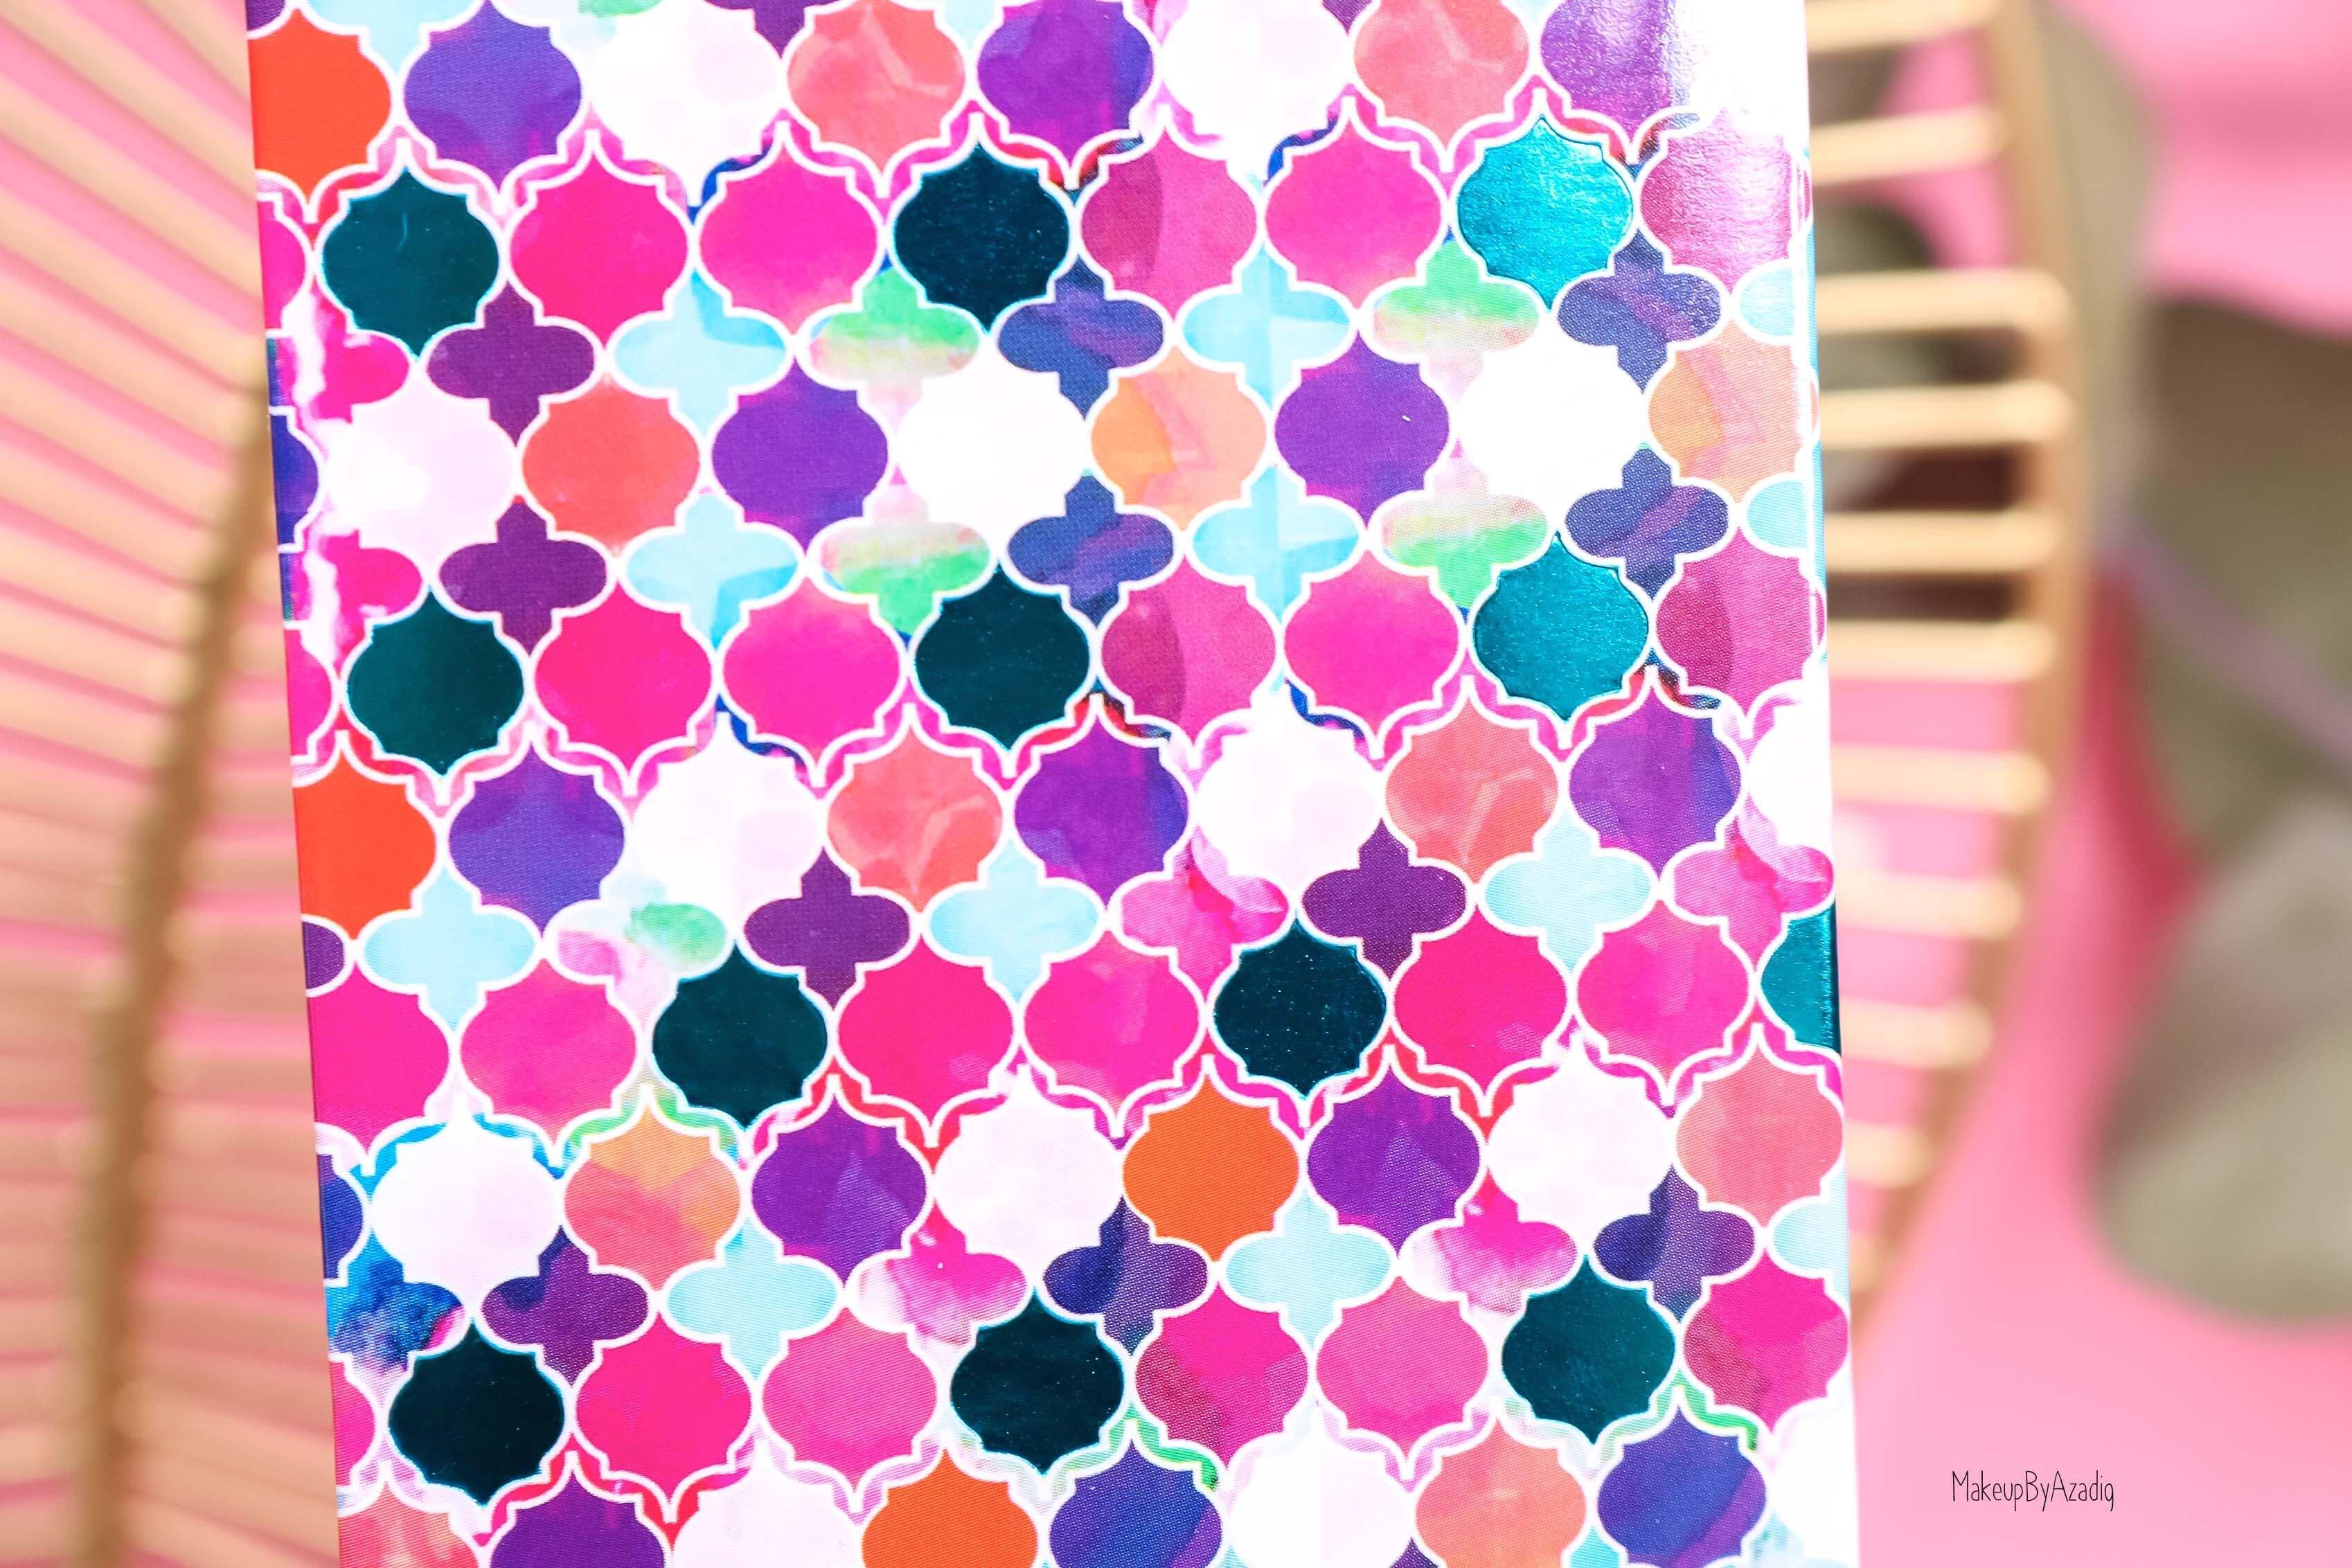 revue-collection-delirium-floral-baija-paris-corps-bougie-gommage-soin-fleurs-makeupbyazadig-avis-prix-sephora-colors